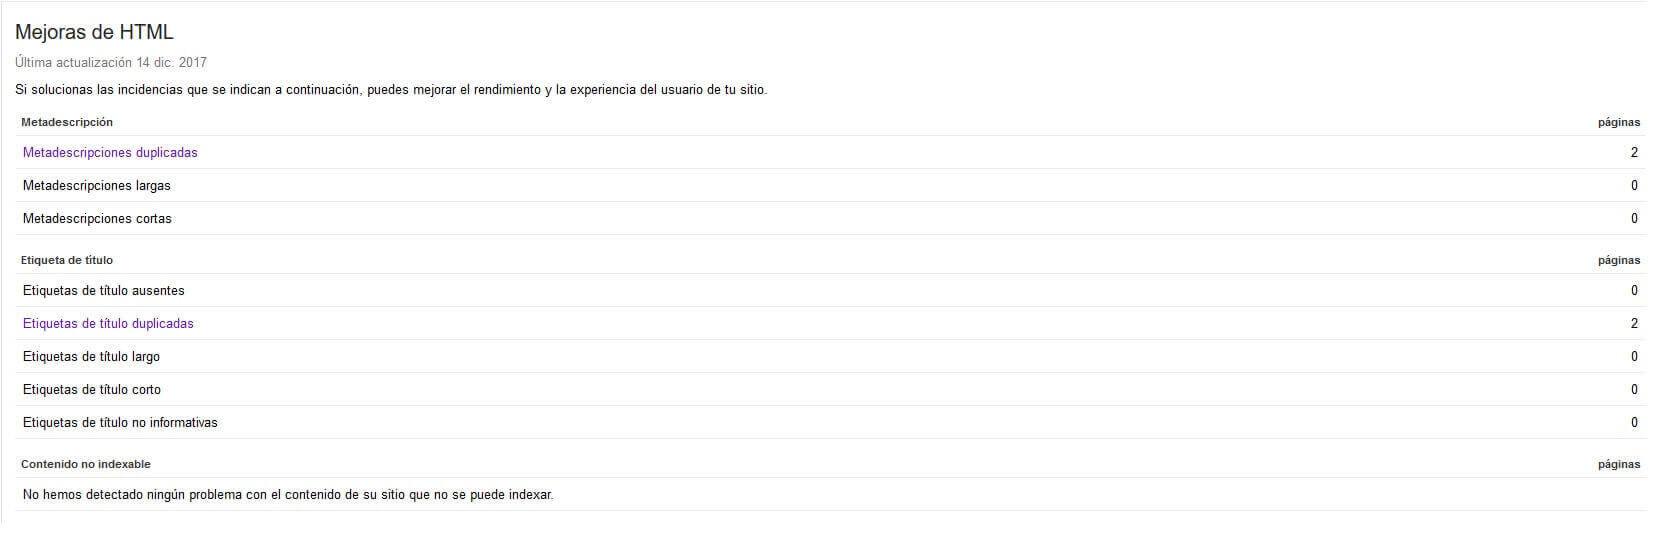 mejoras de html